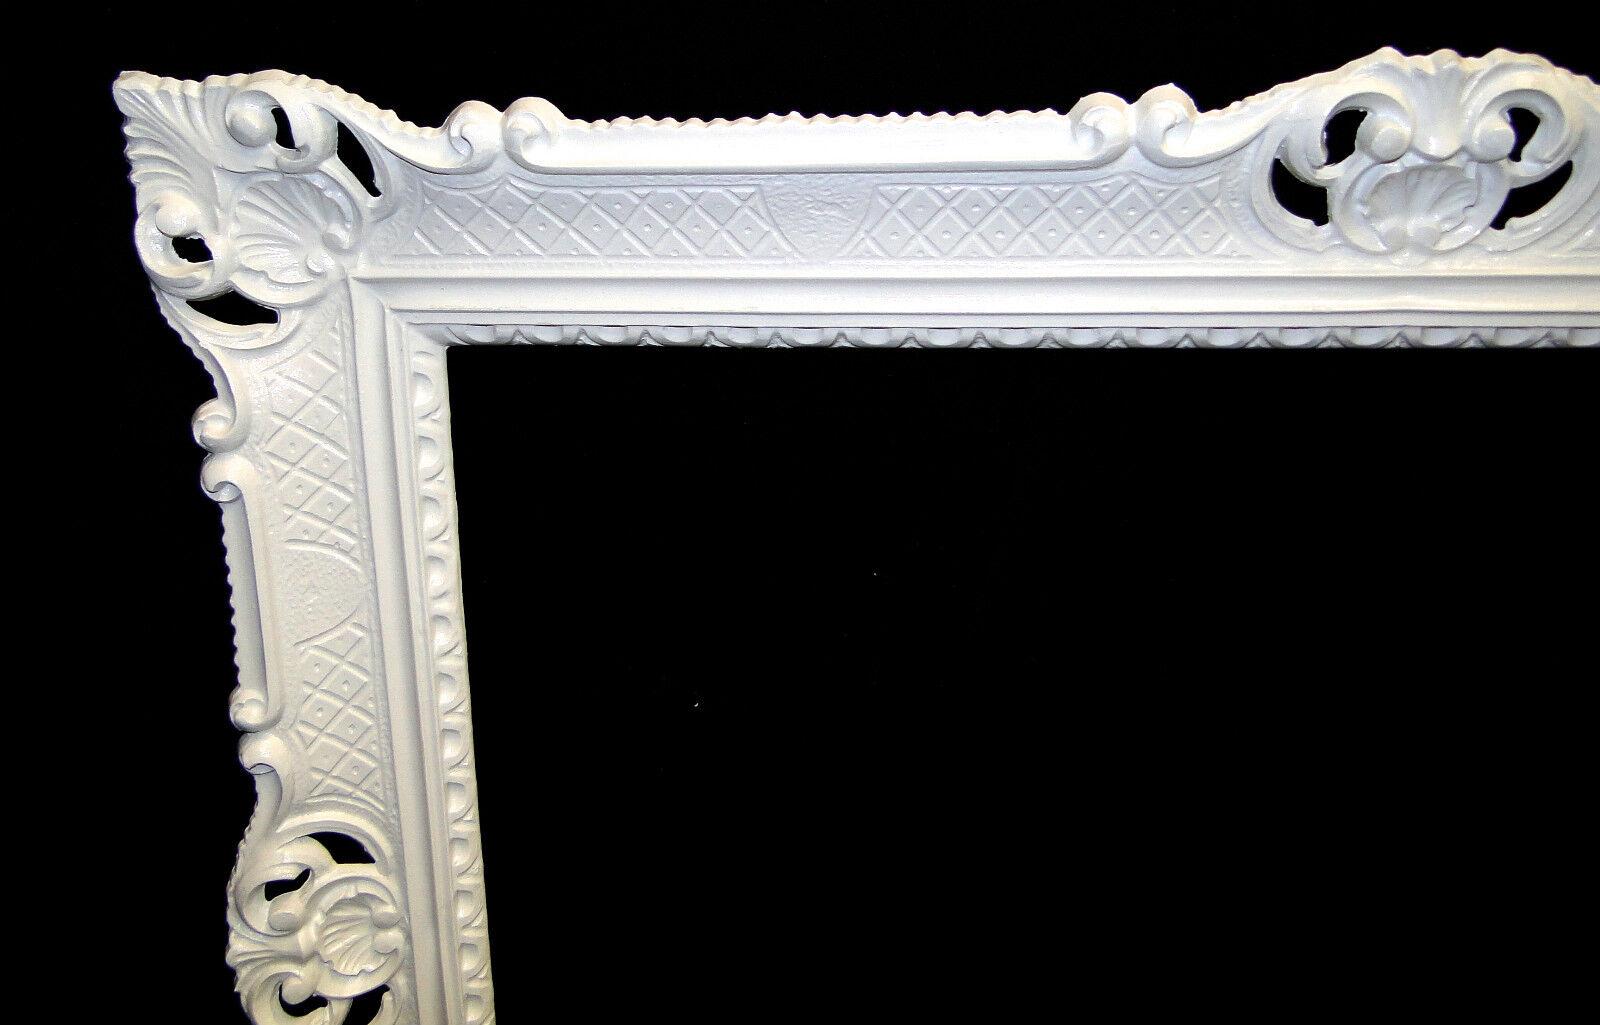 bilderrahmen barock 70x90 bilderrahmen jugendstill antik rechteckig gross wei ebay. Black Bedroom Furniture Sets. Home Design Ideas